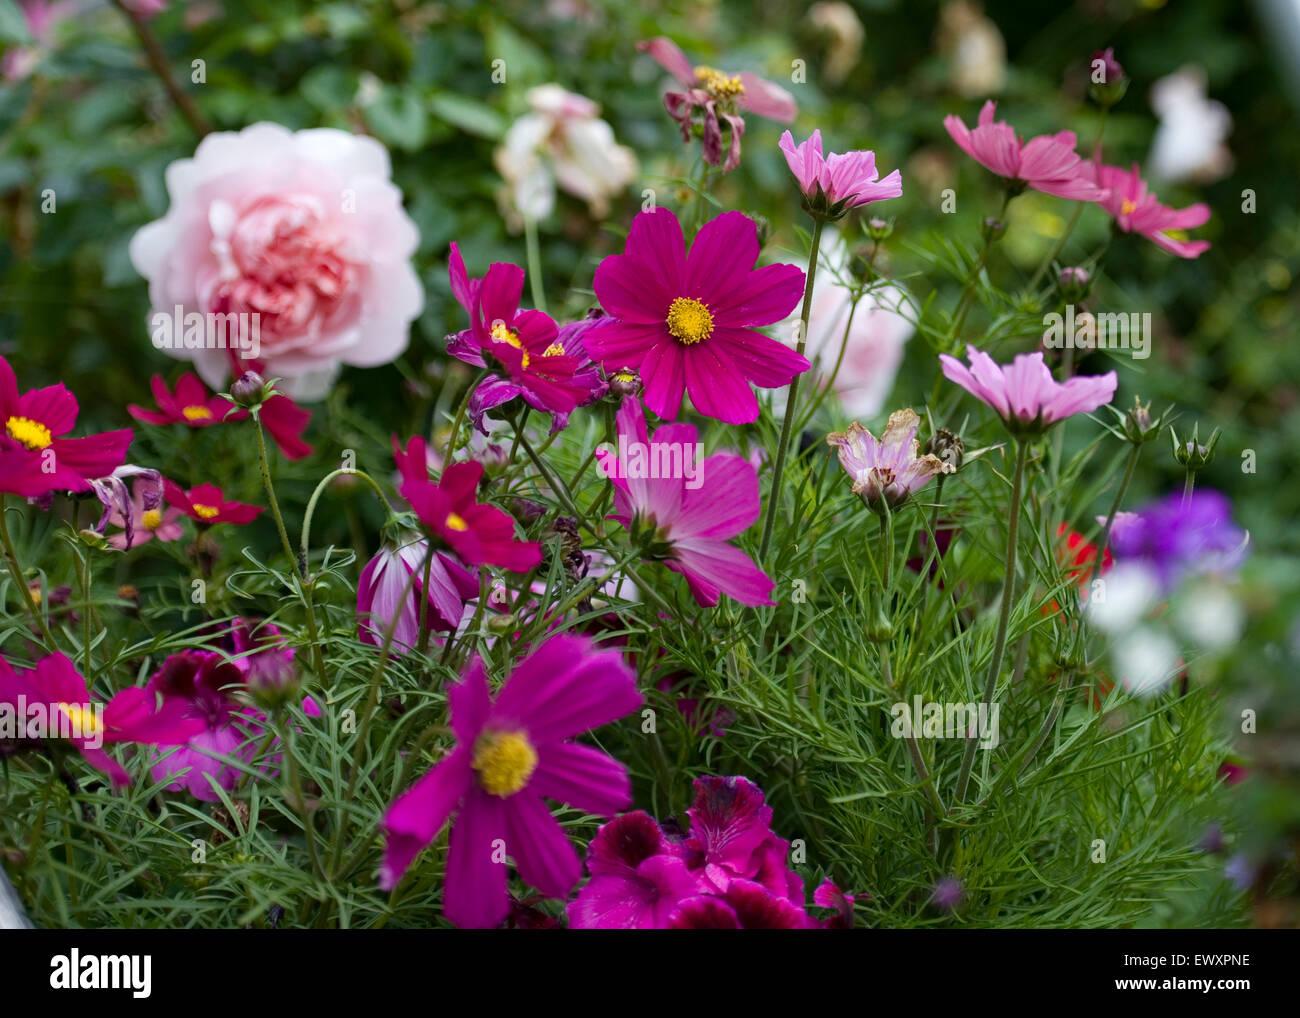 cottage garden border flowers - Stock Image